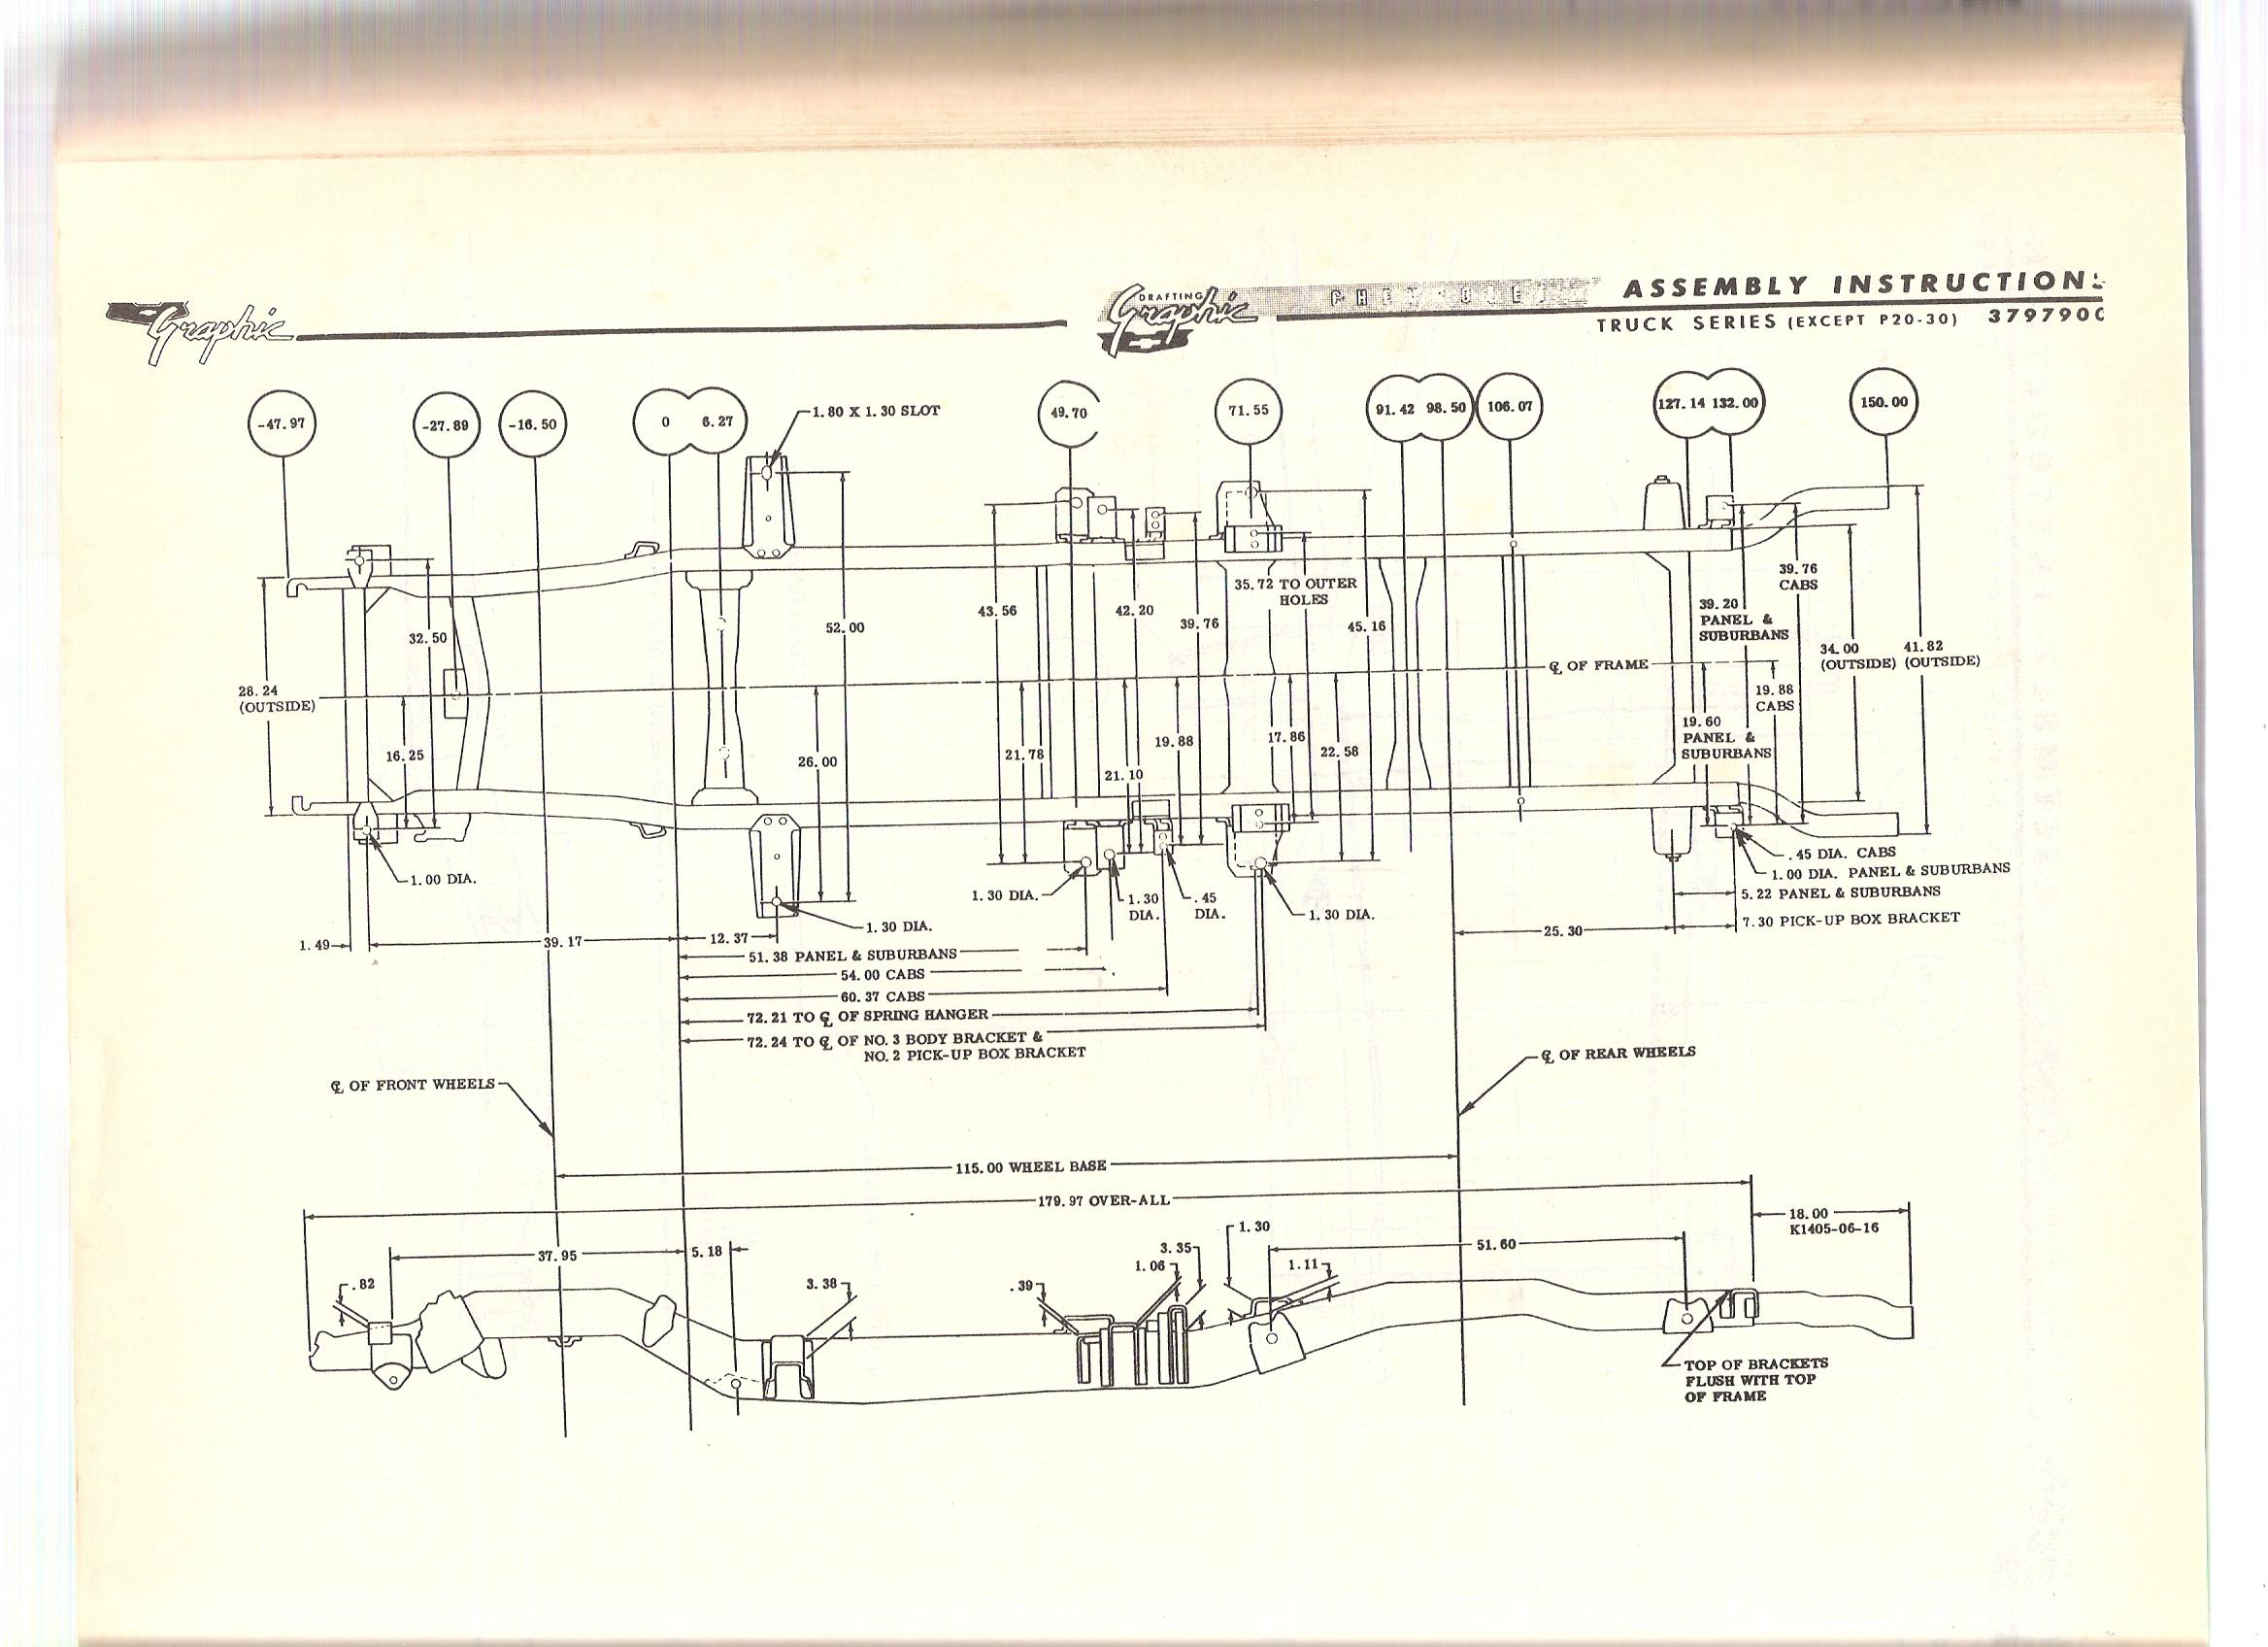 79 chevy truck wiring diagram hotpoint aquarius gmc electrical diagrams 36